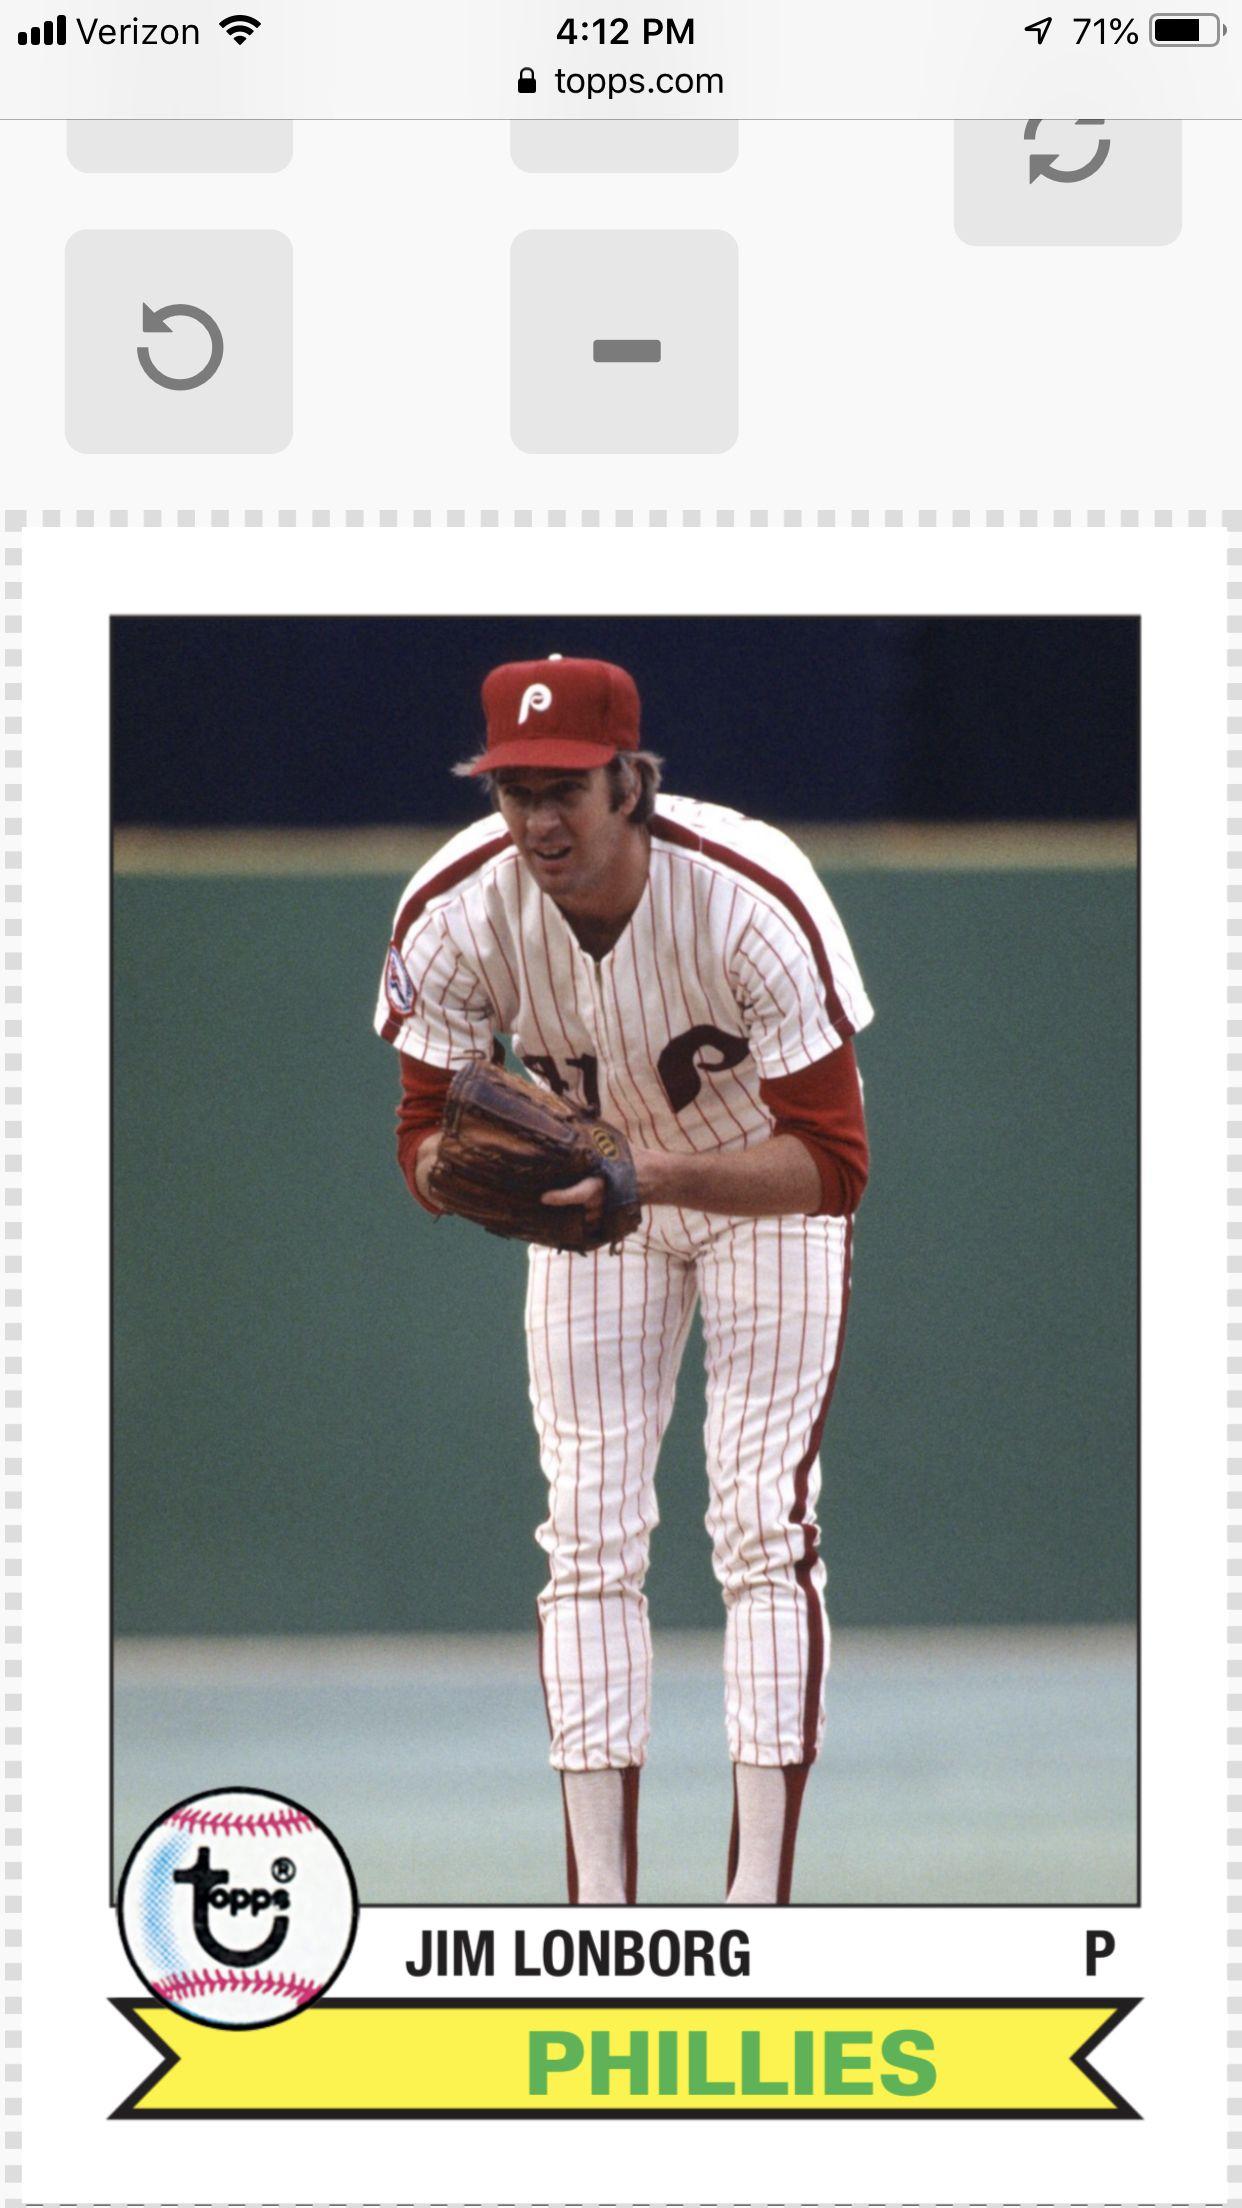 Pin by John Bradley on phillies Phillies, Baseball cards